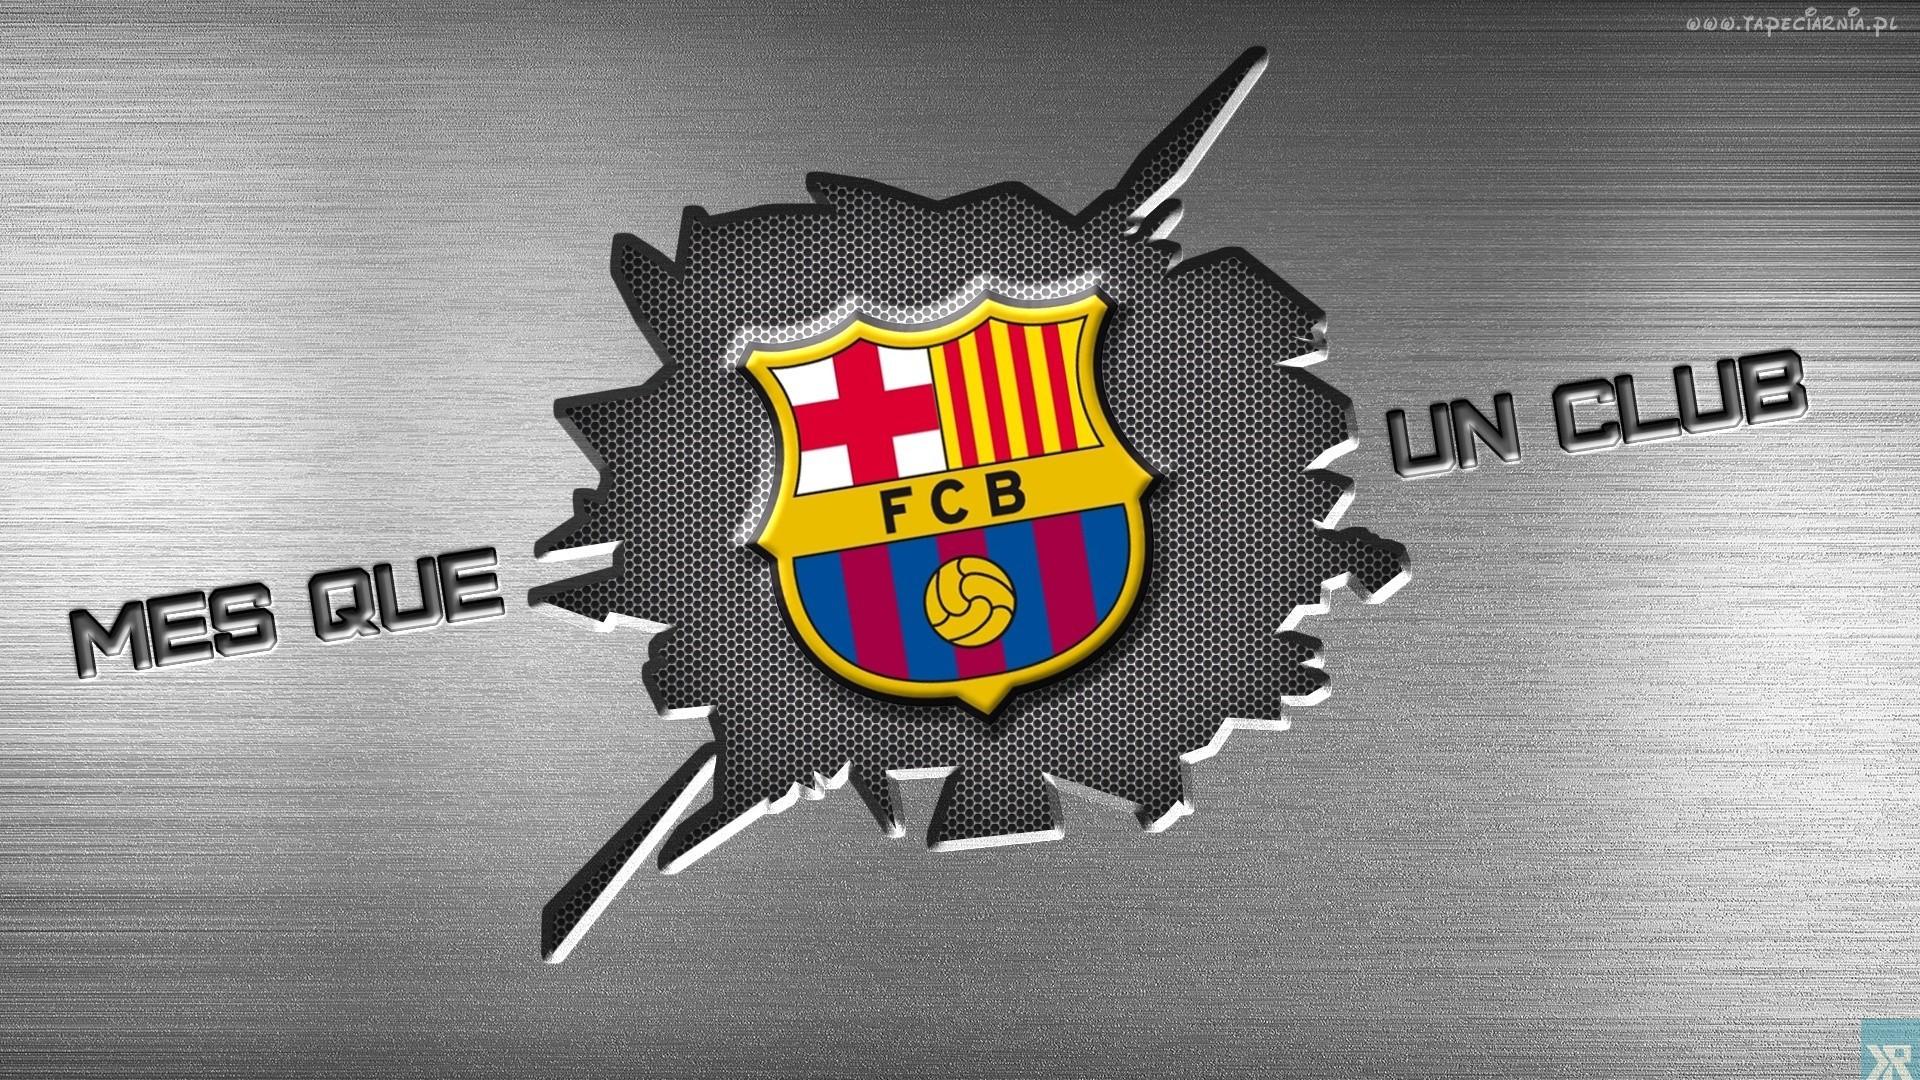 fc barcelona – Download Hd fc barcelona wallpaper for desktop and